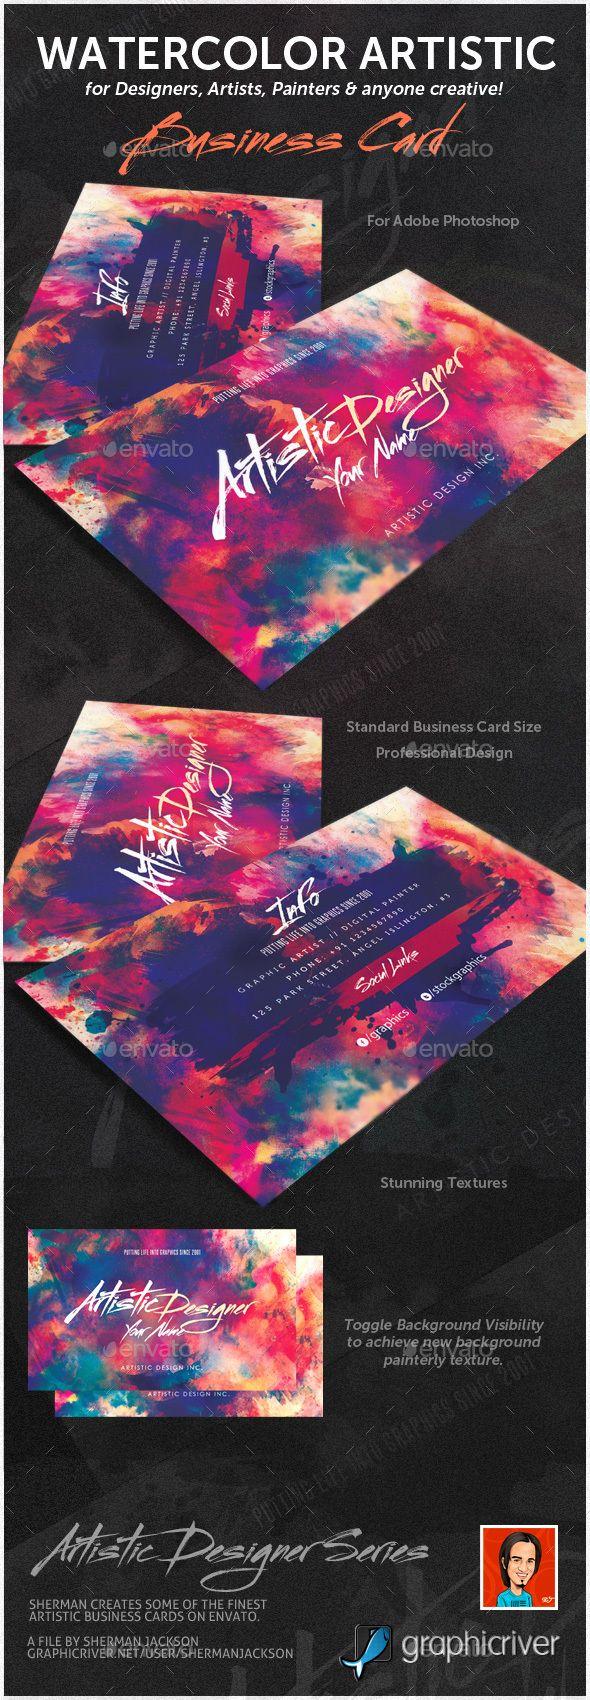 Watercolour Designer Artistic Business Card Business Cards Creative Artist Business Cards Business Card Design